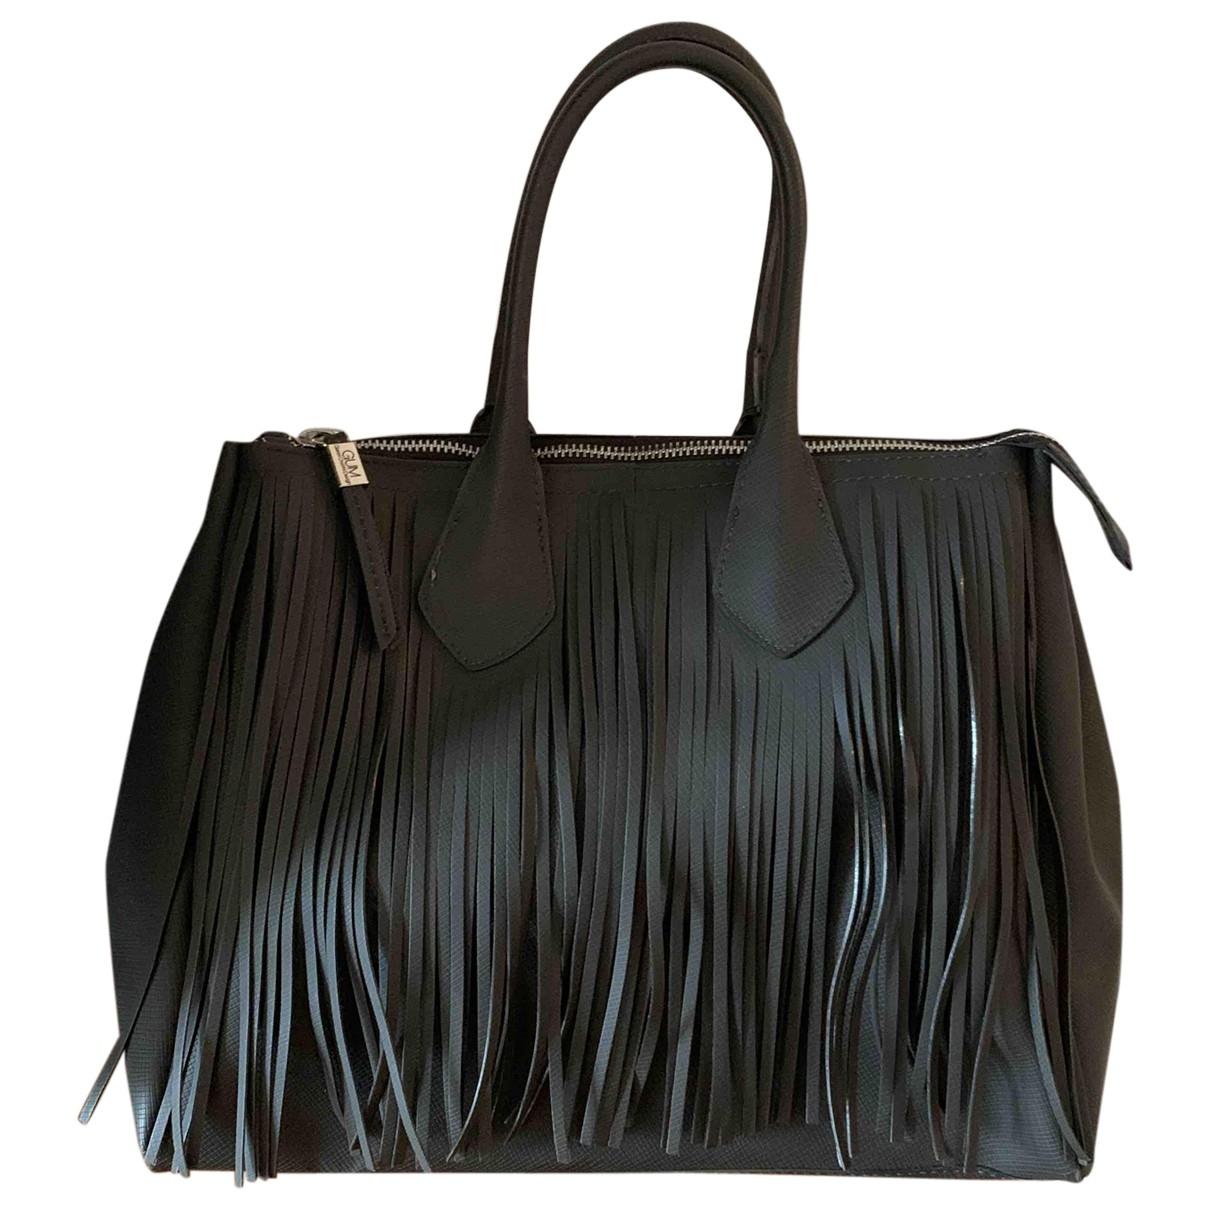 Gianni Chiarini \N Black handbag for Women \N